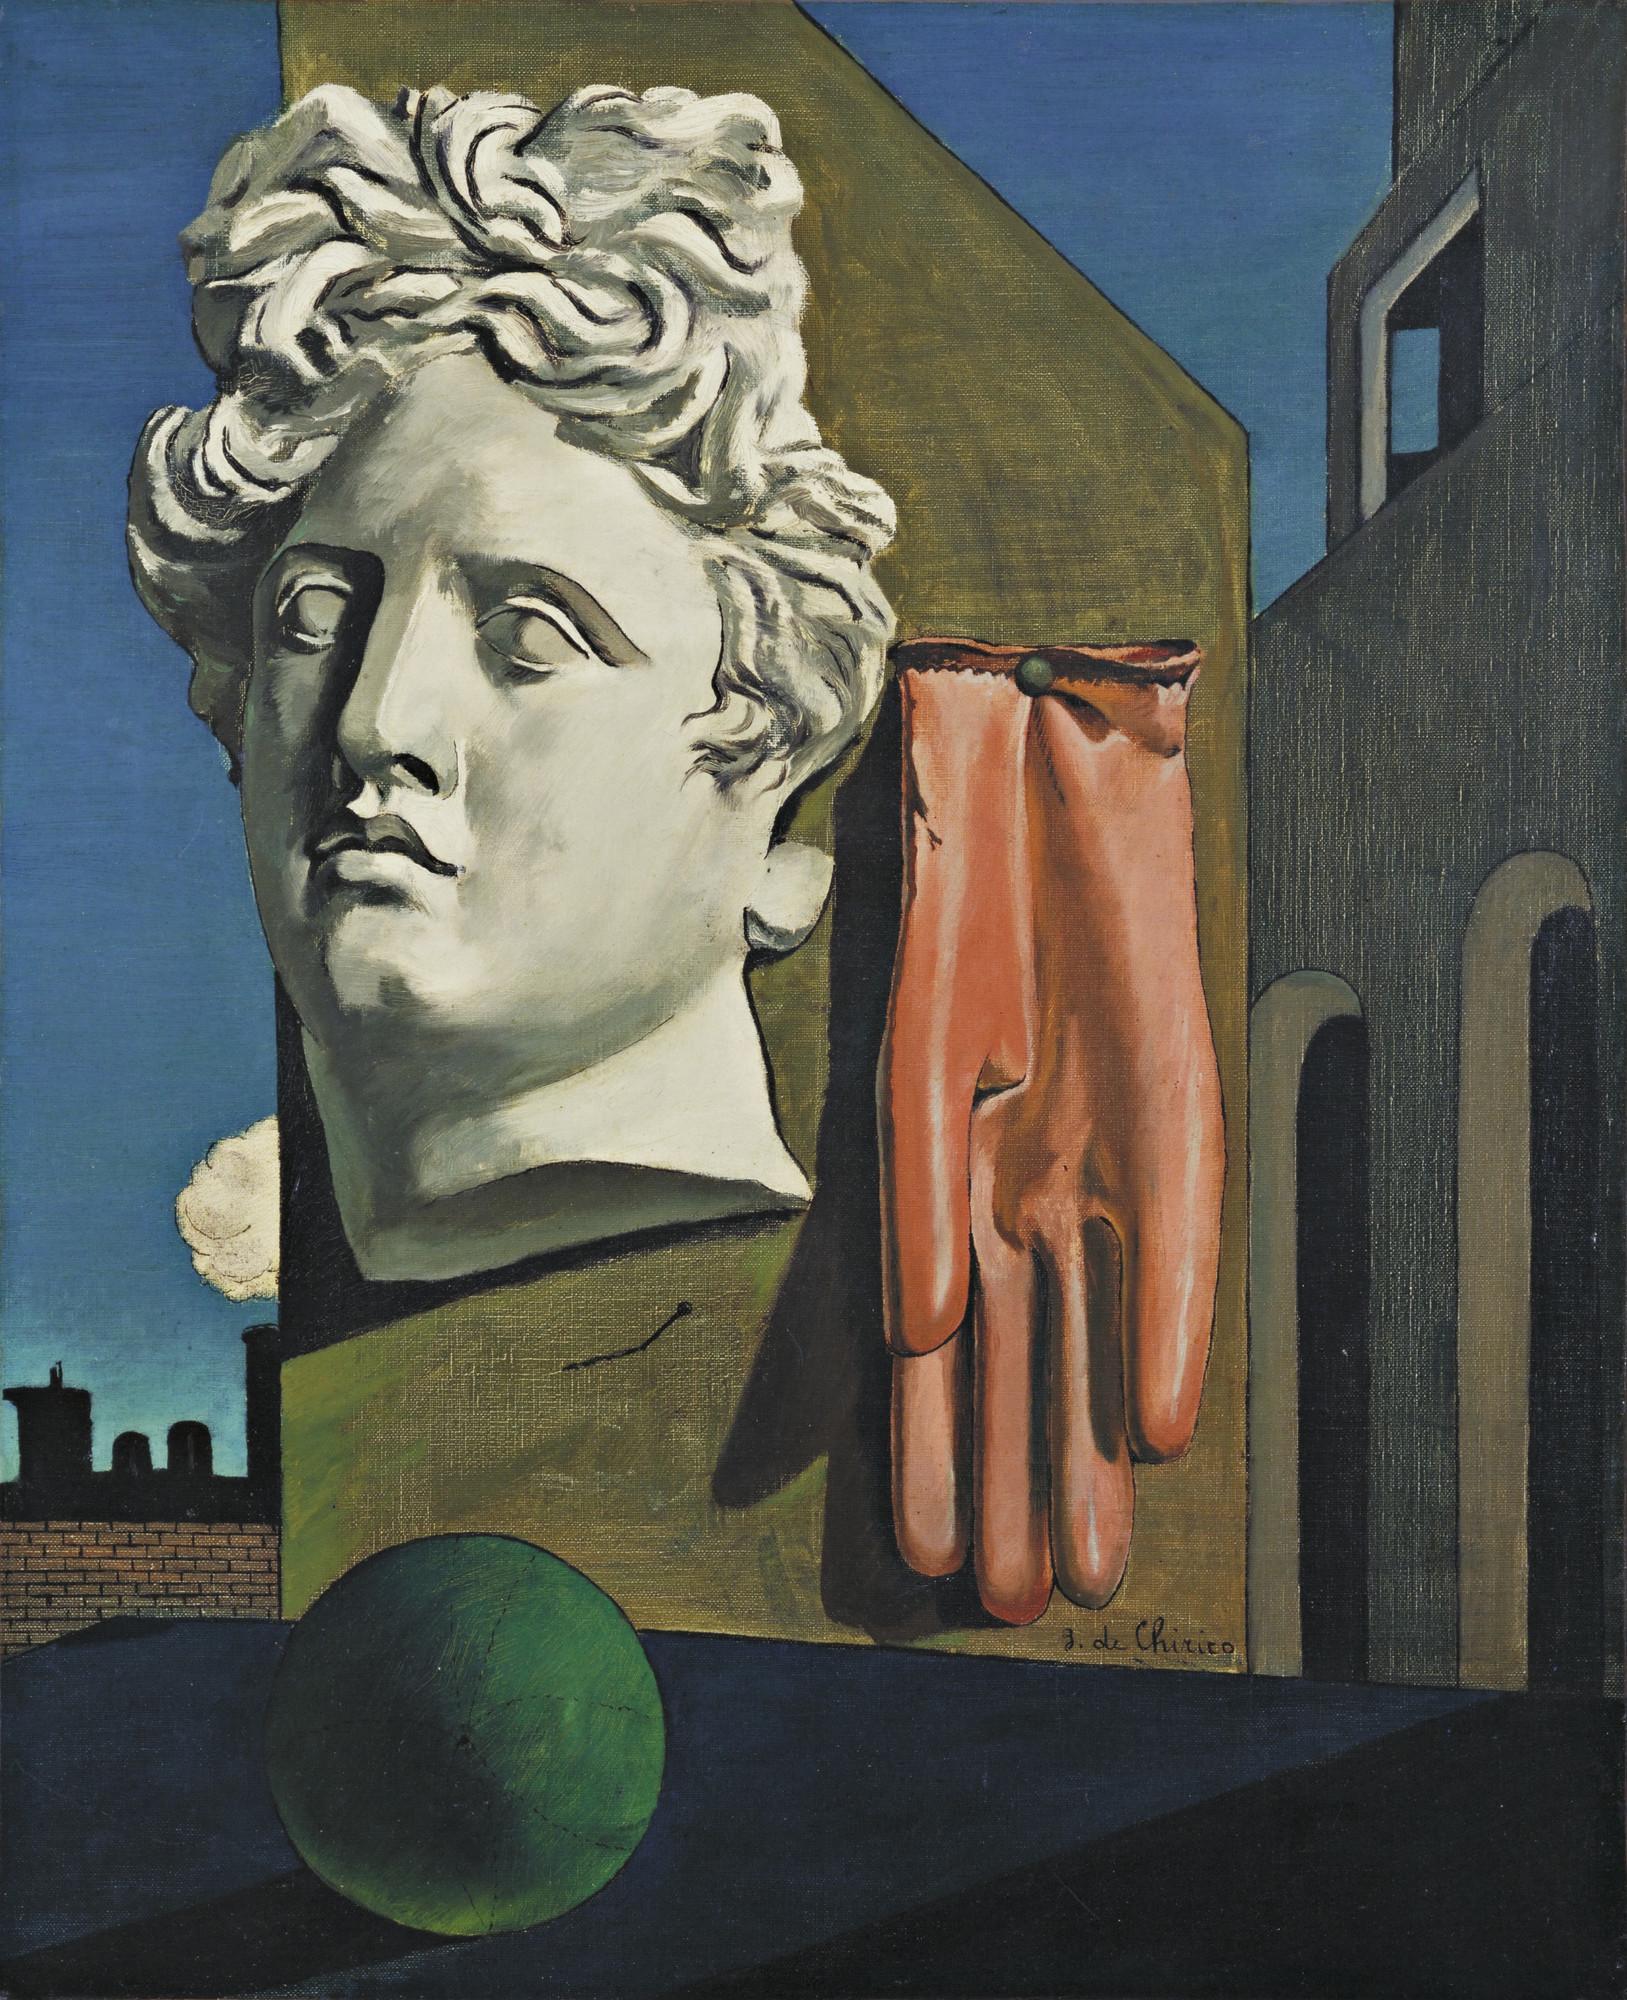 Giorgio de Chirico. The Song of Love. Paris, June-July 1914 | MoMA